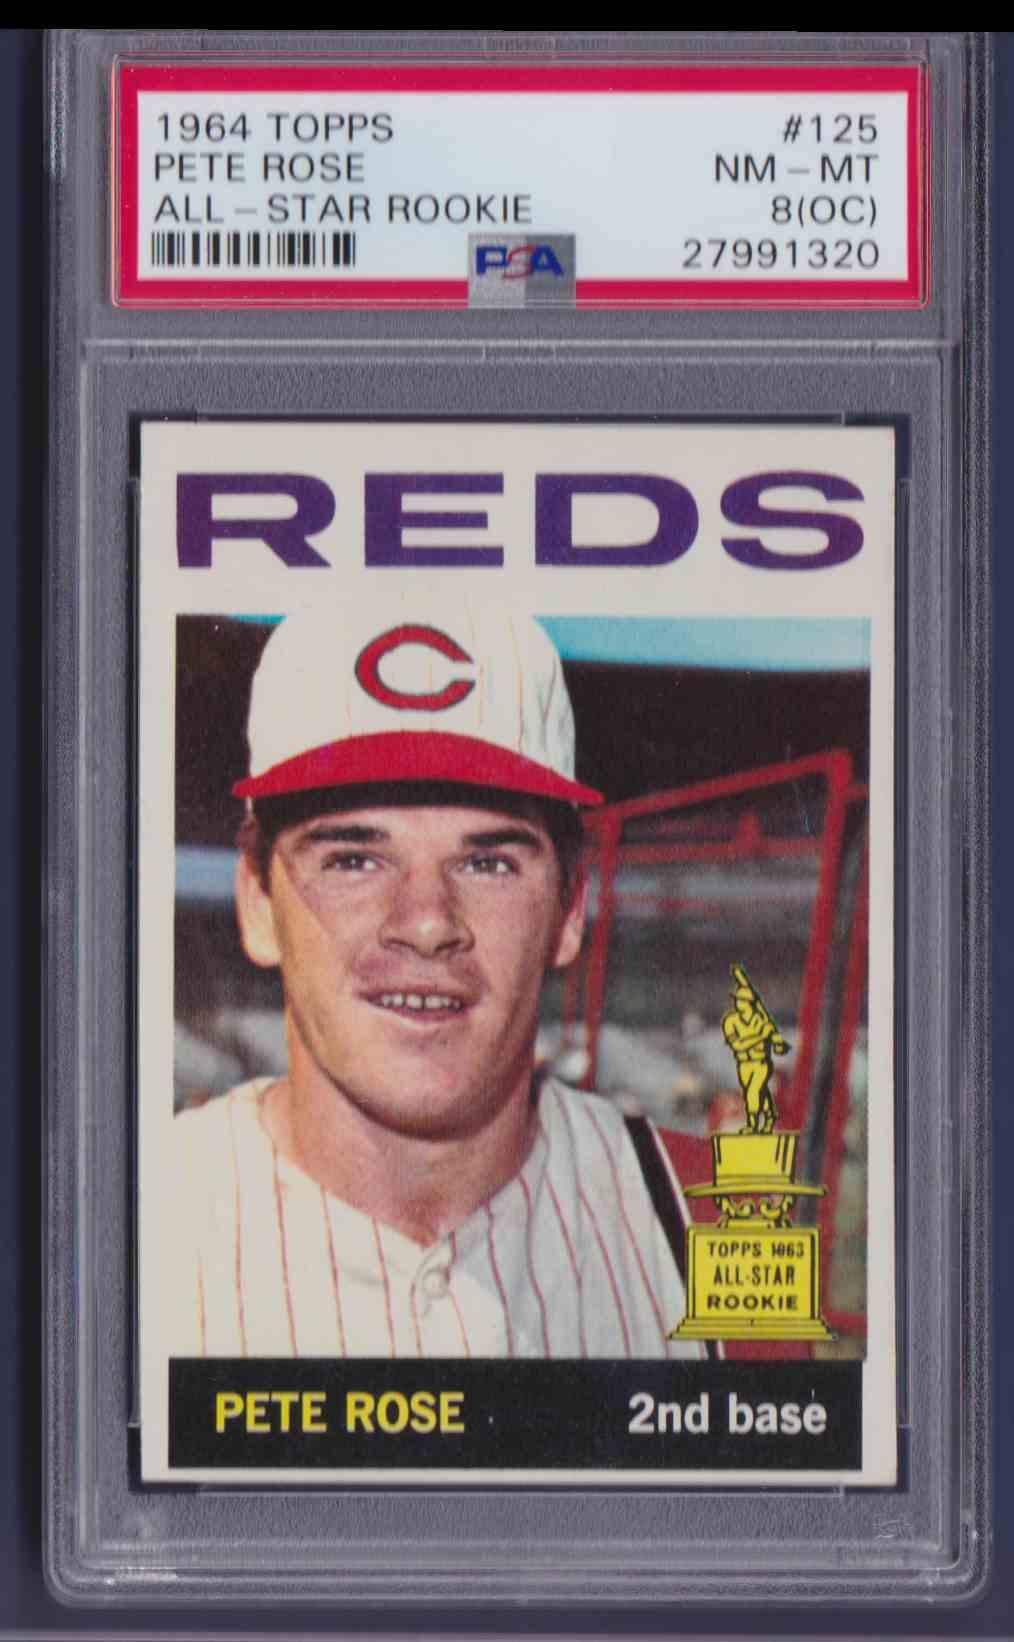 1964 Topps Pete Rose All Star Rookie 125 On Kronozio